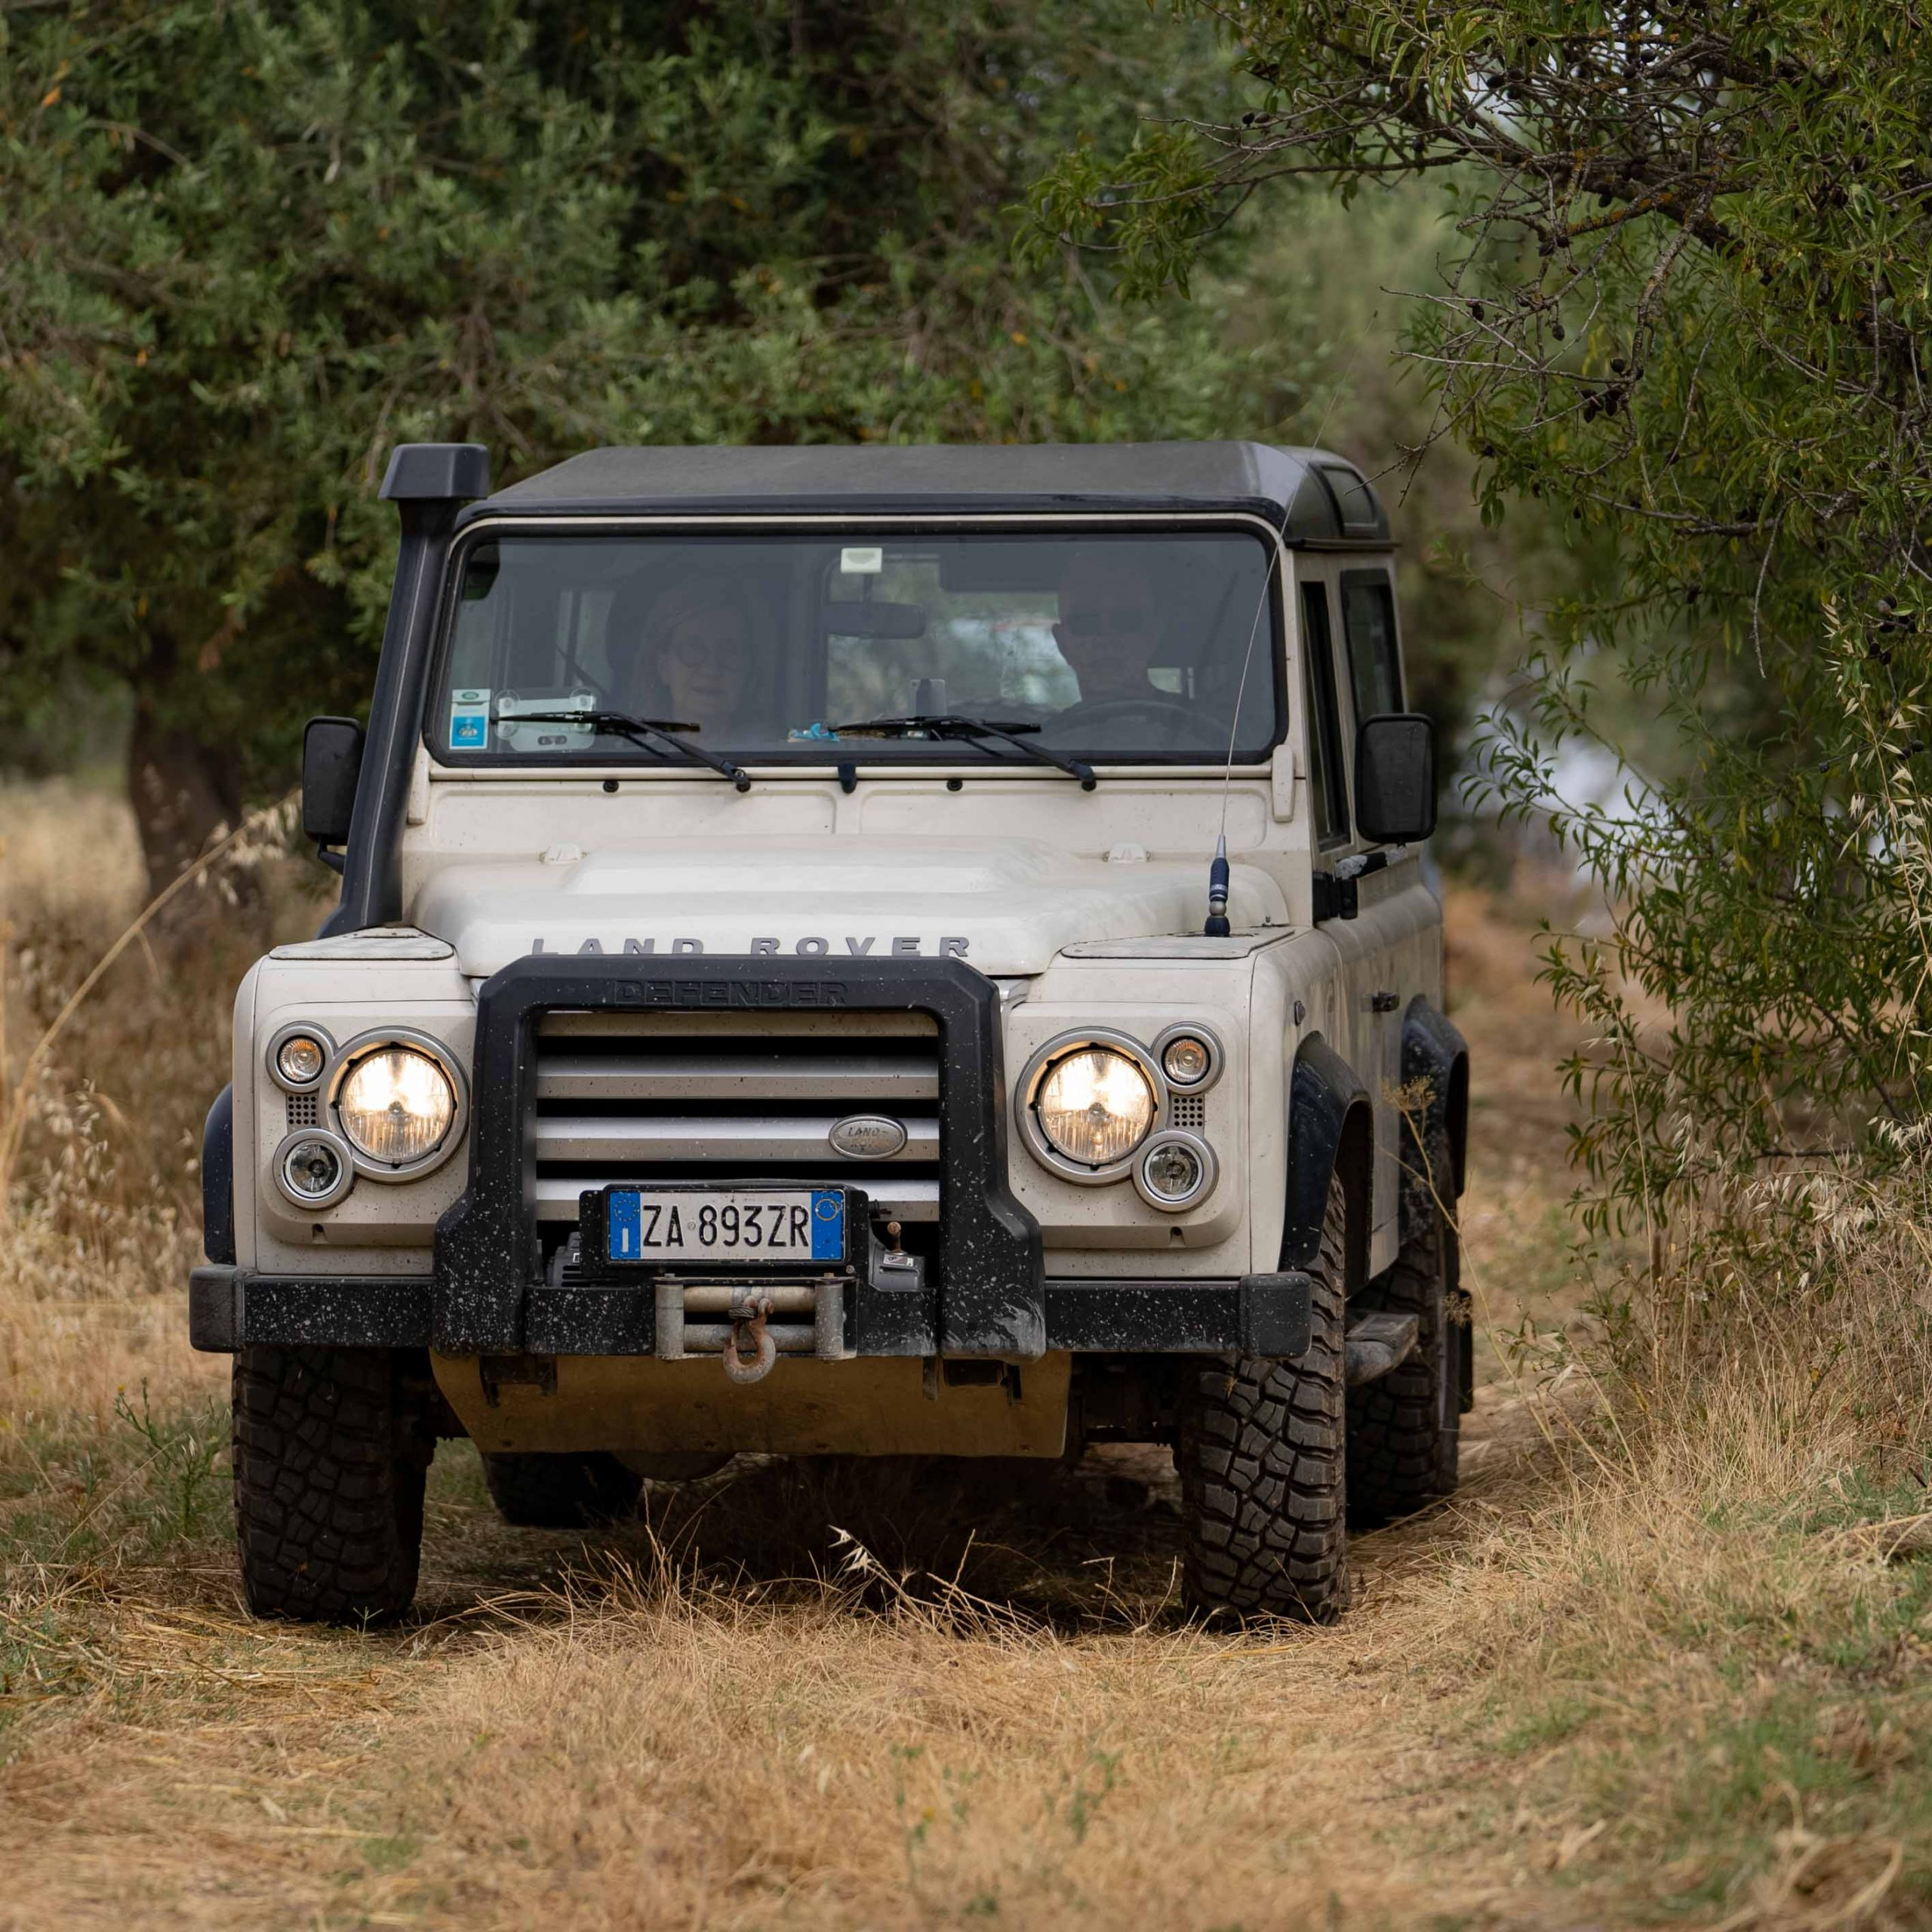 Land_Rover_Tour_Sicilia_2021_Land_Rover_Experience_Italia_-4